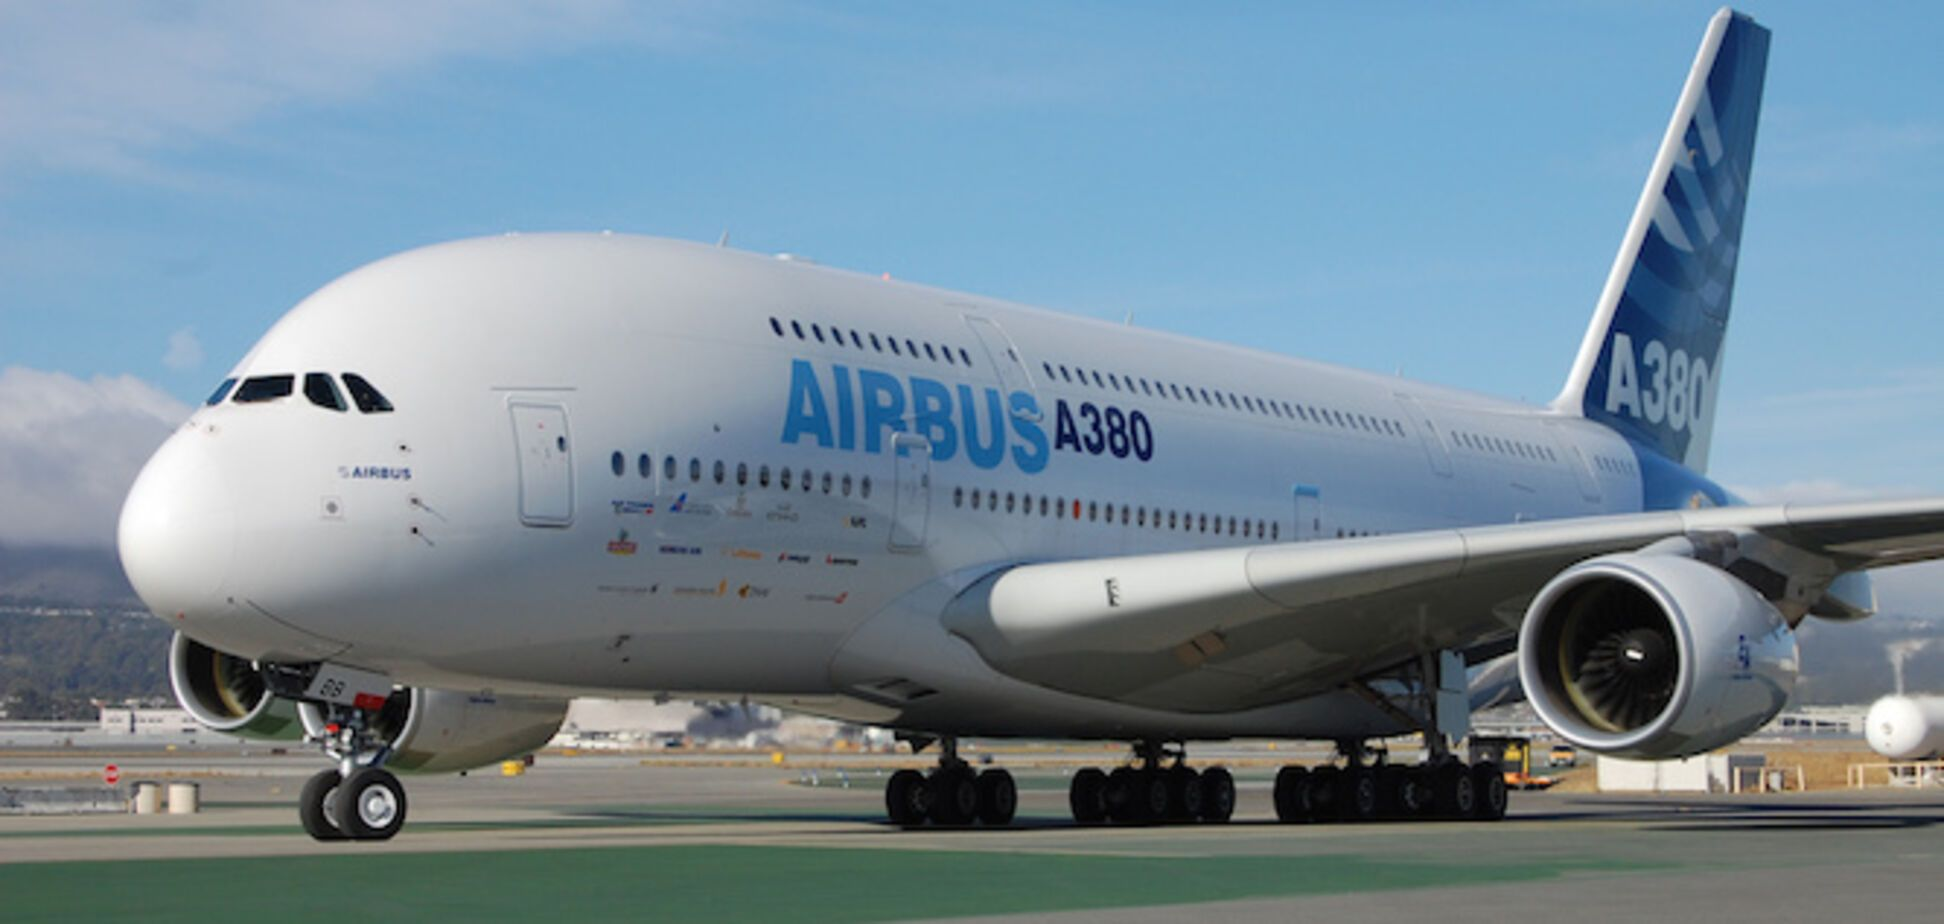 Airbus A380. Источник: Flexport